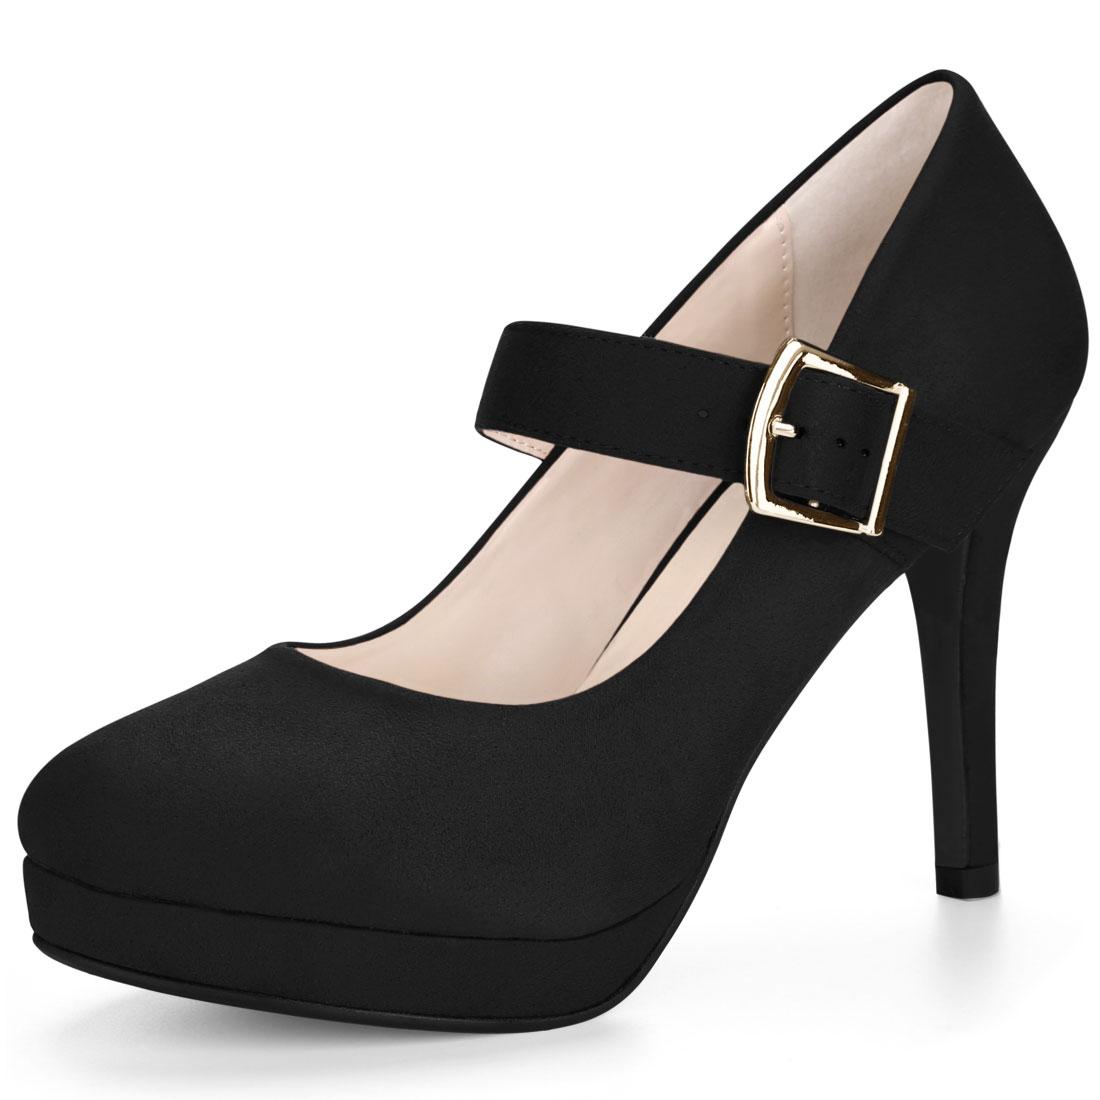 Allegra K Women's Rounded Toe Stiletto Platform Buckle Strap Pumps Black US 9